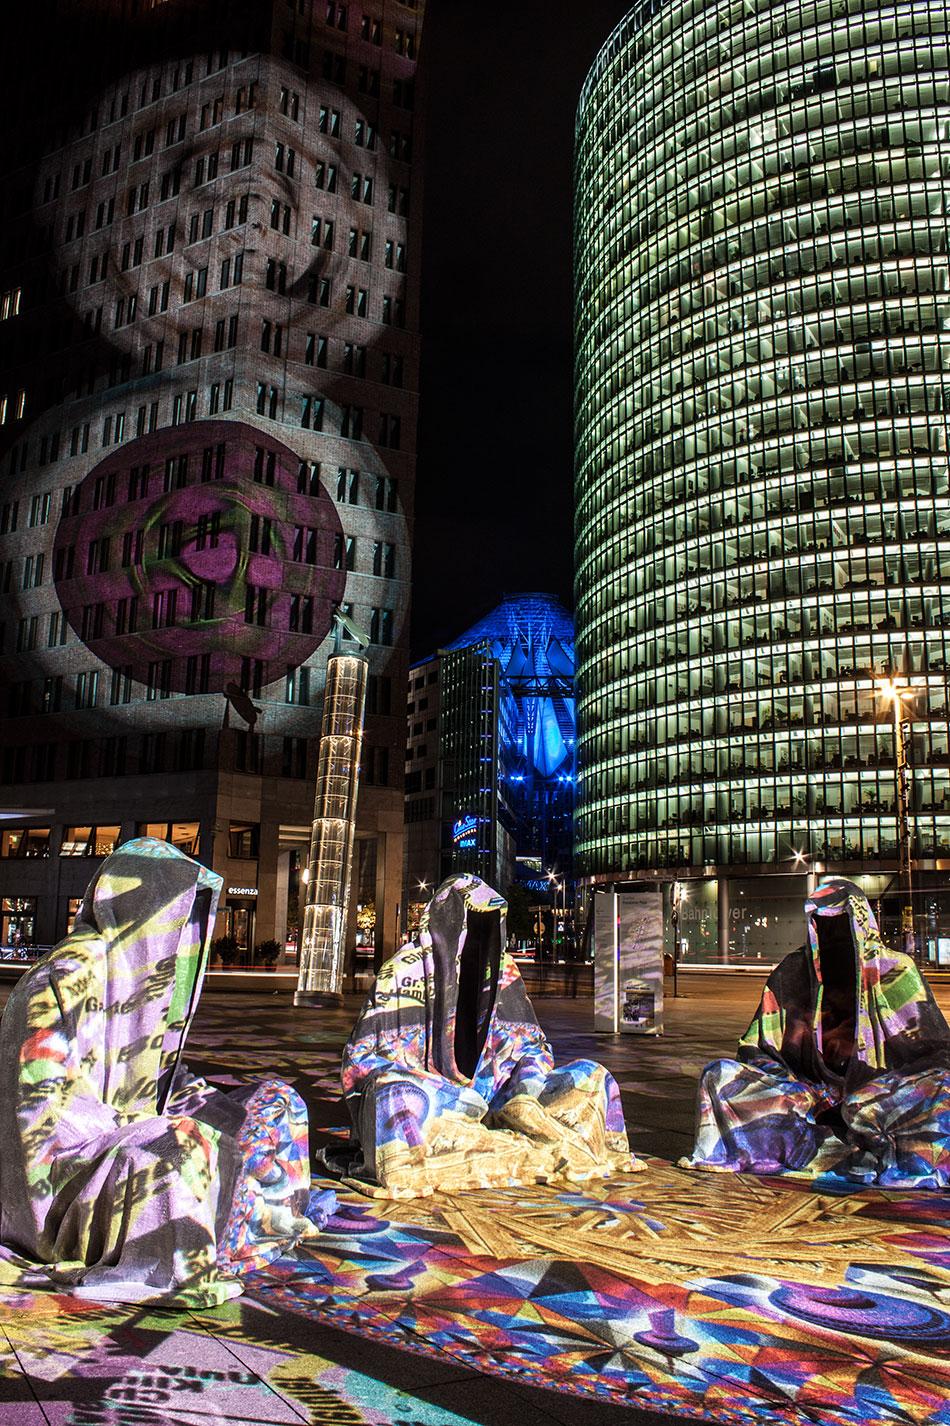 festival-of-lights-berlin-potzdamer-platz-light-art-show-exhibition-lumina-guardians-of-time-manfred-kili-kielnhofer-contemporary-arts-design-large-scale-monumental-public-sculpture-3535